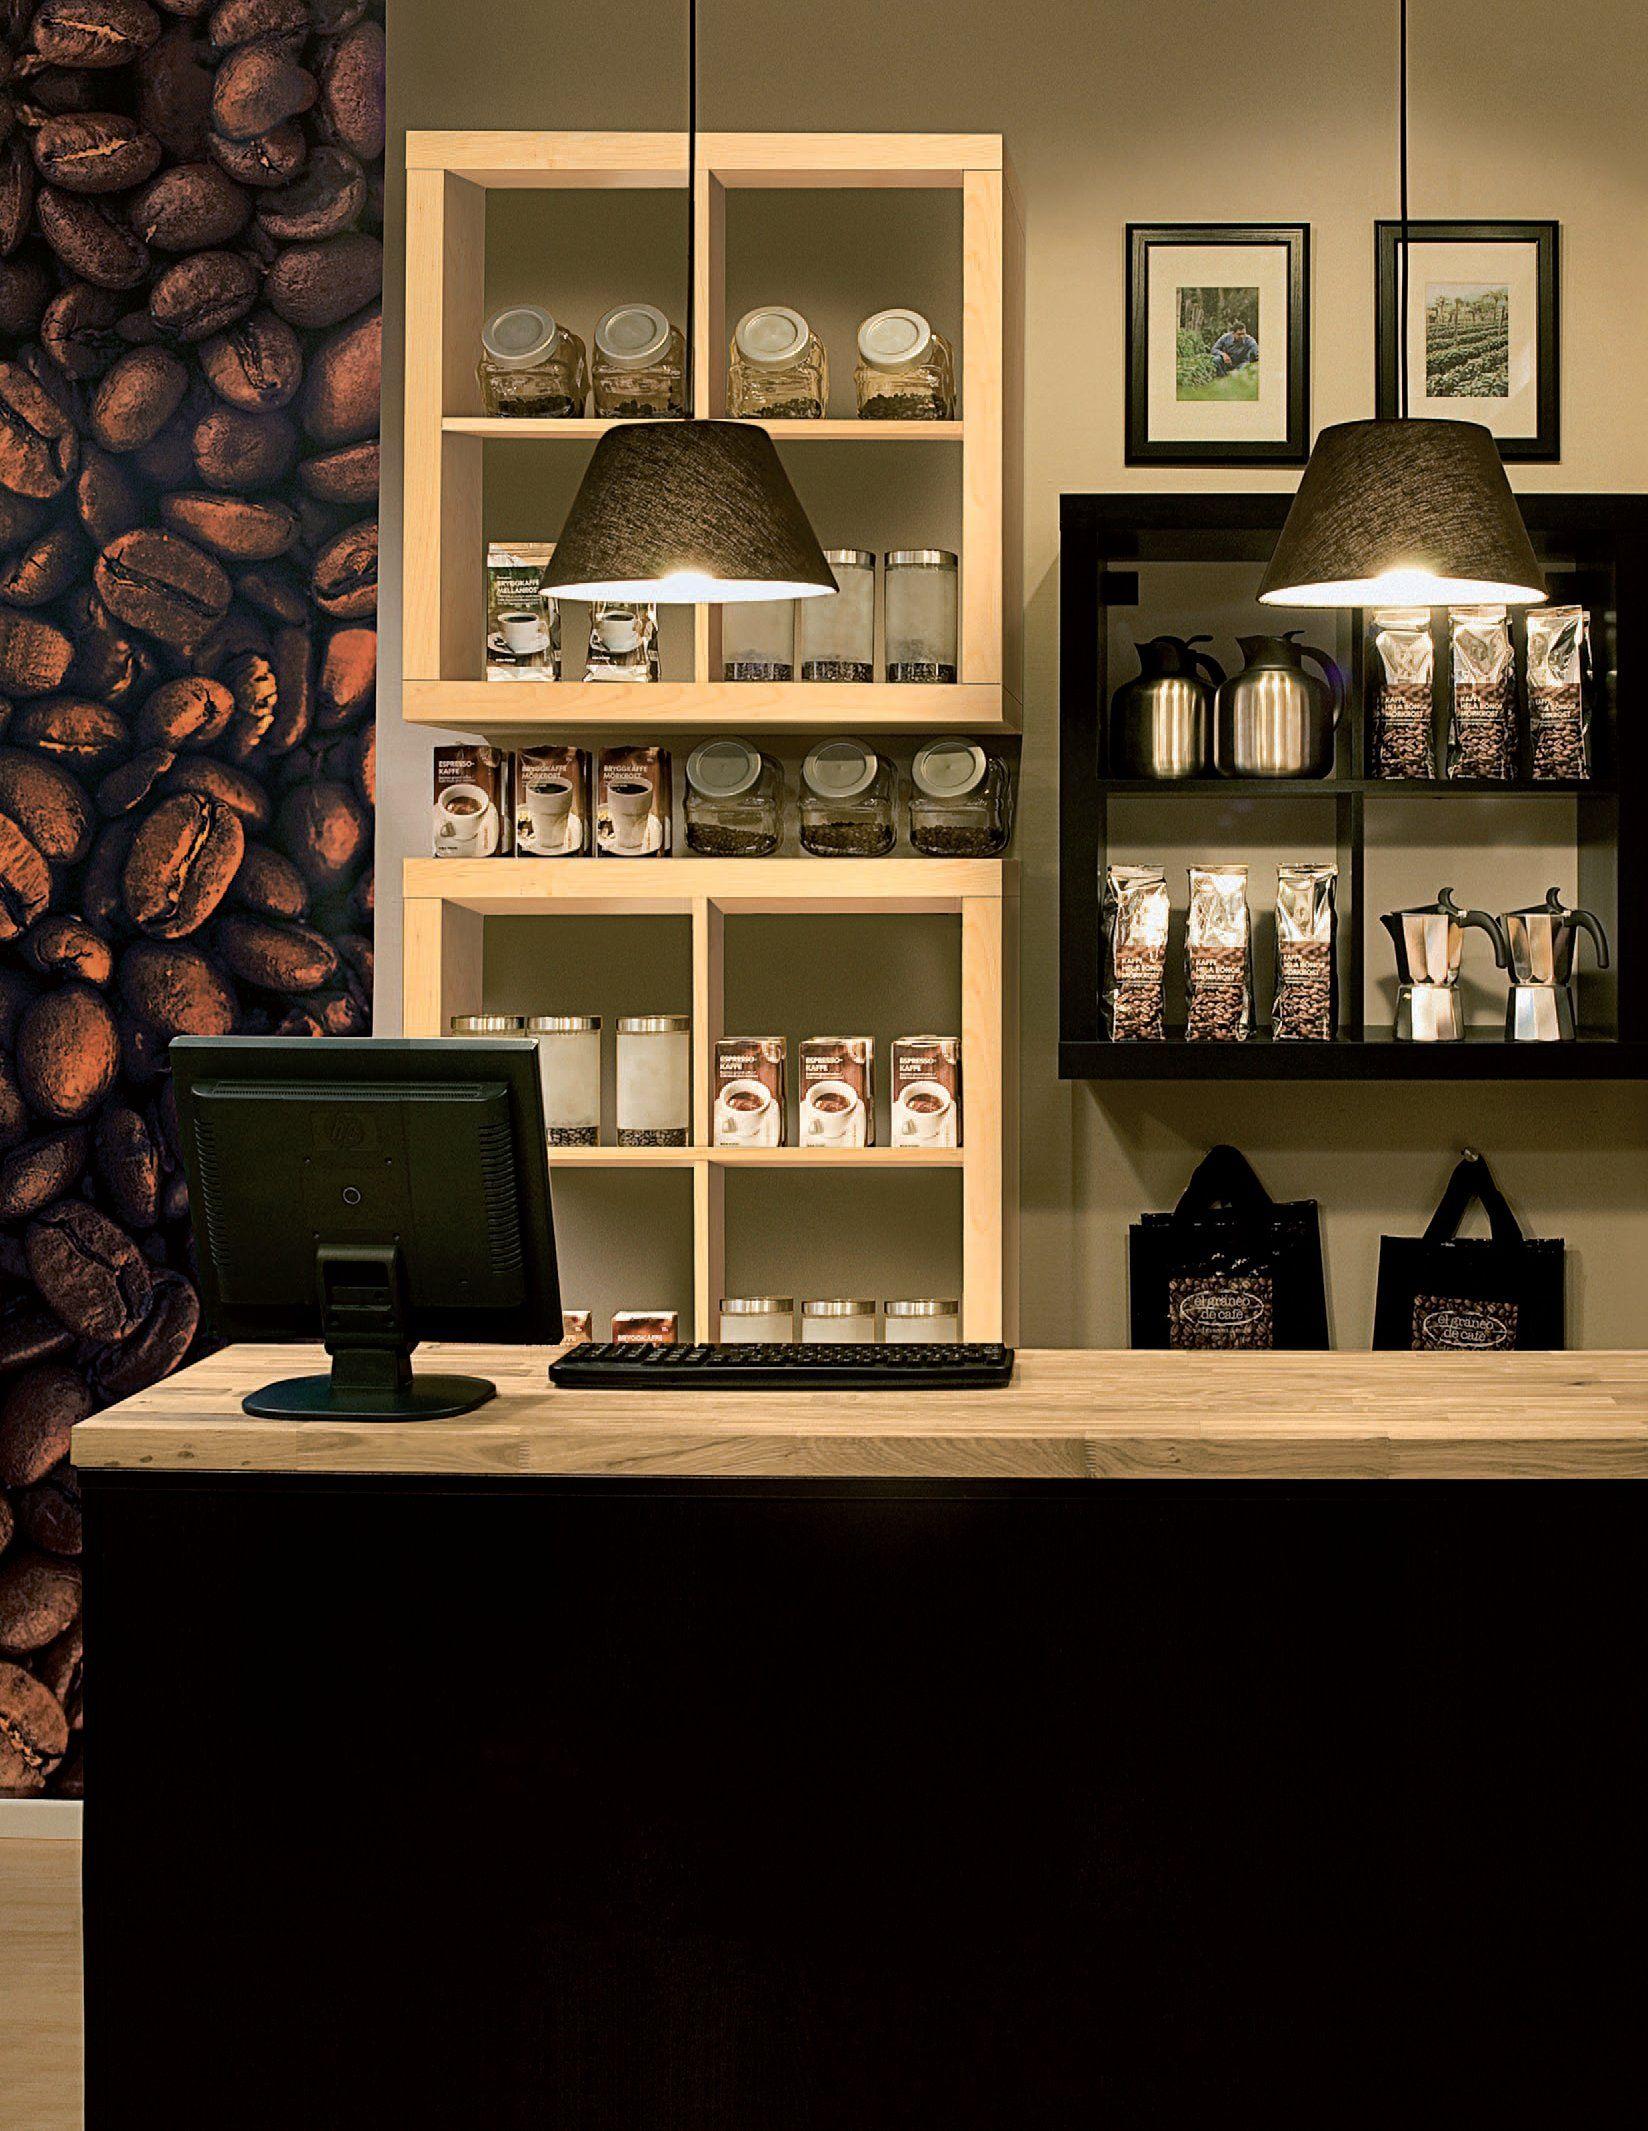 Cafe coffee dayshare price